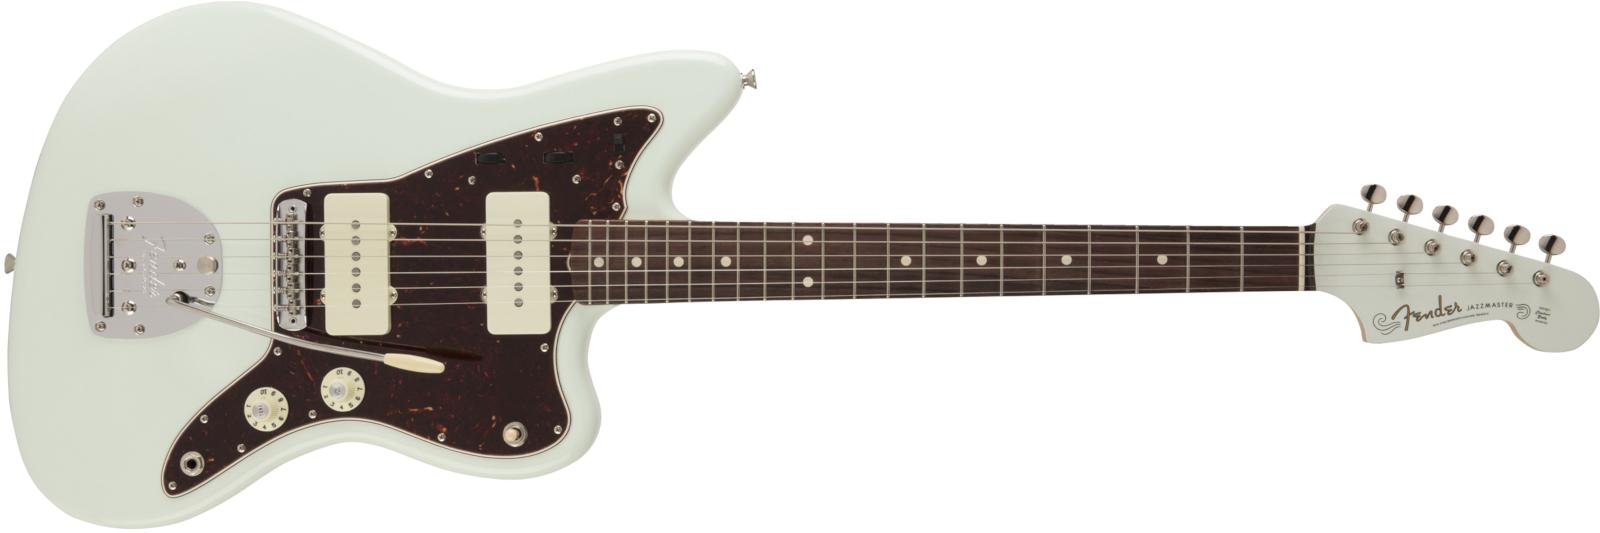 Fender MADE IN JAPAN 2018 LIMITED COLLECTION 60S JAZZMASTER® fender-limited  model jazz master